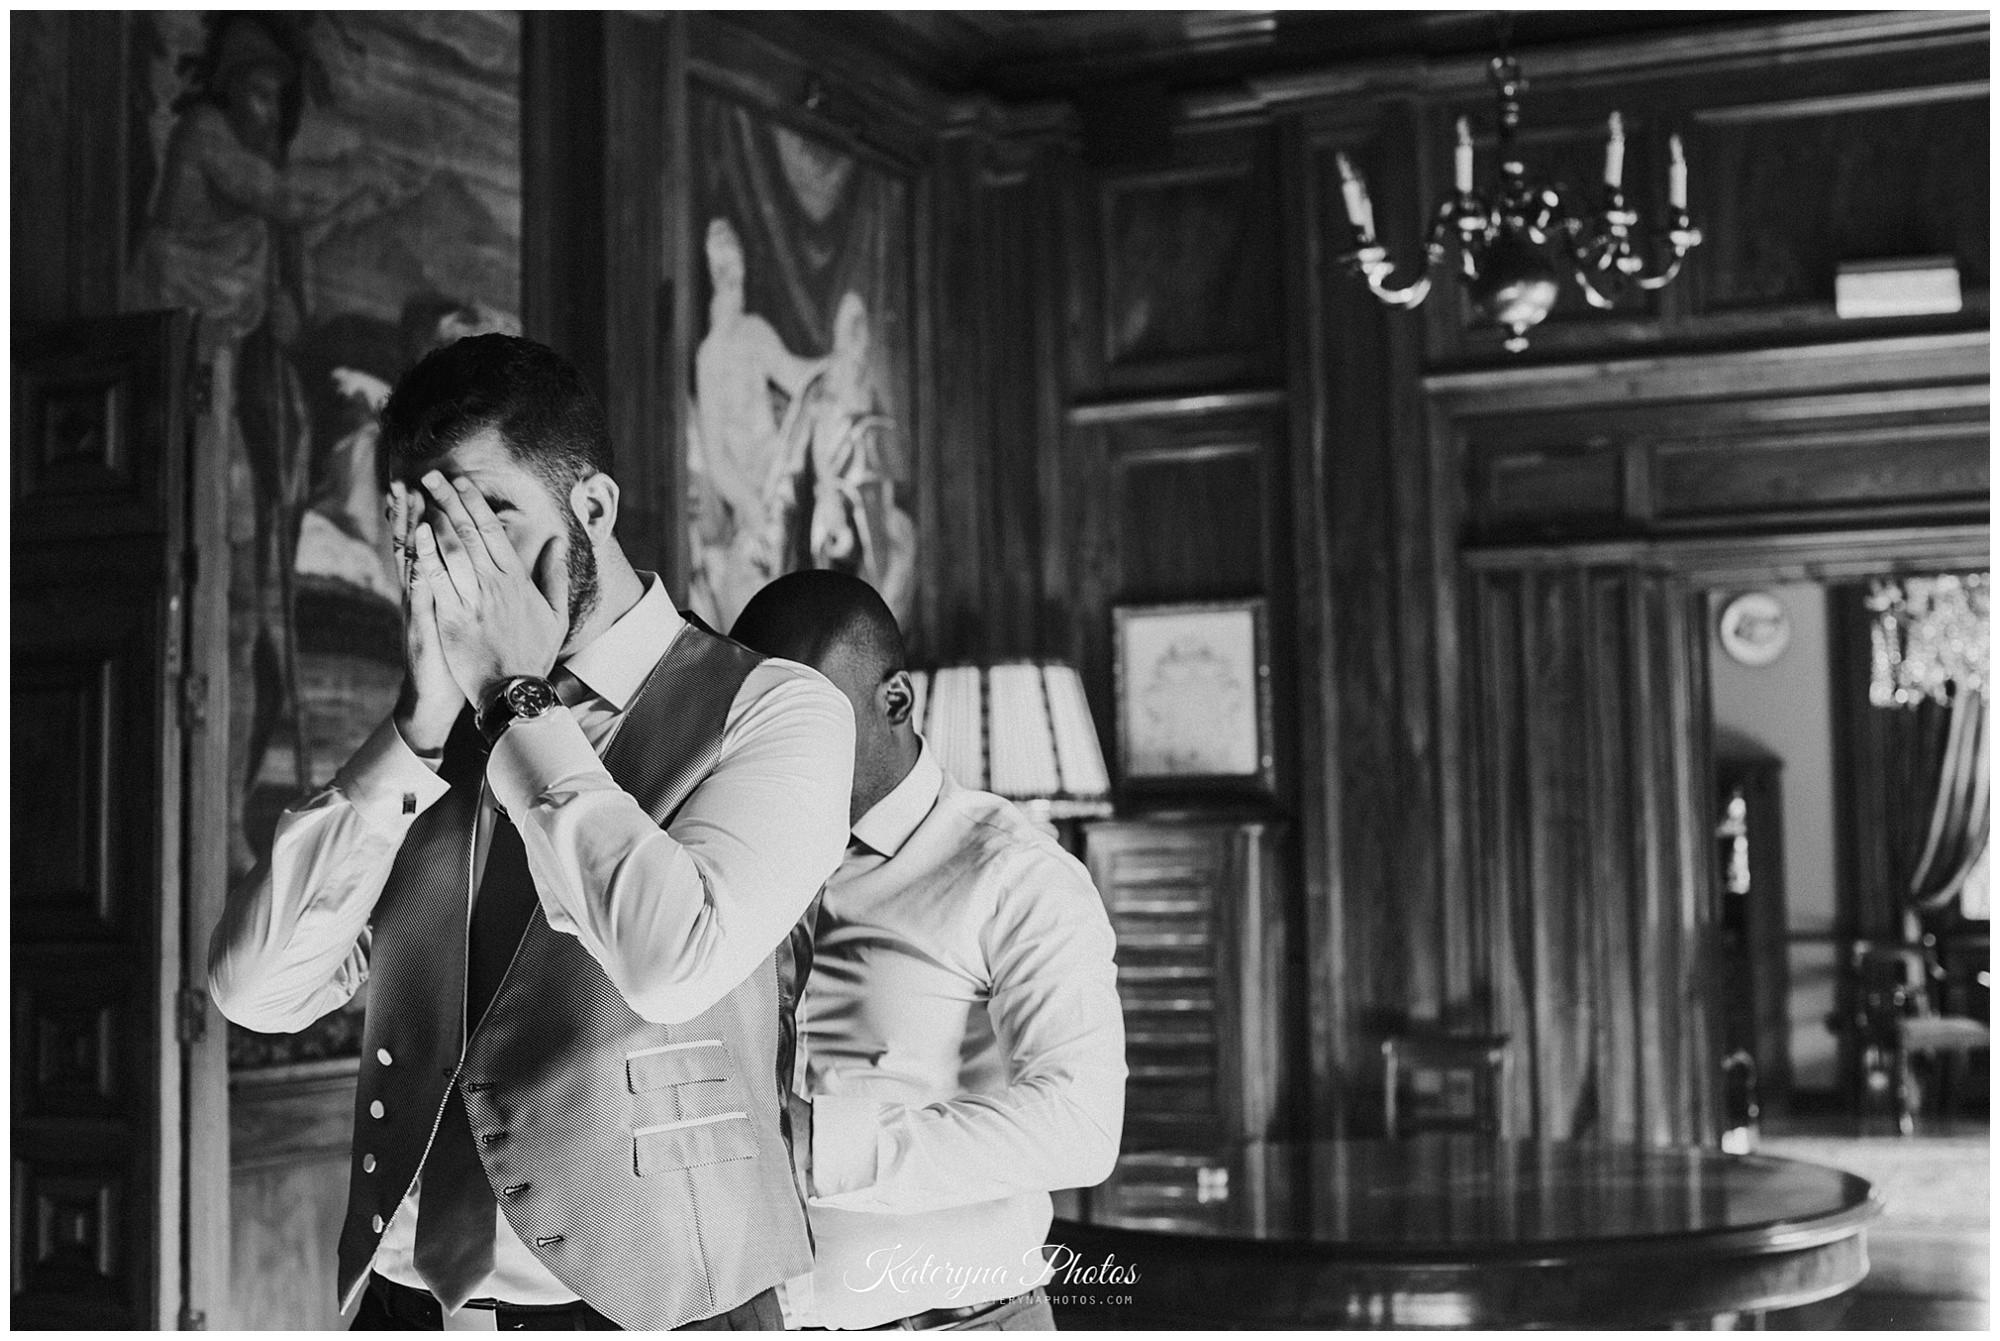 Kateryna-photos-photographe-boda-wedding-barcelona-bell-reco-catalunya_bw-foto